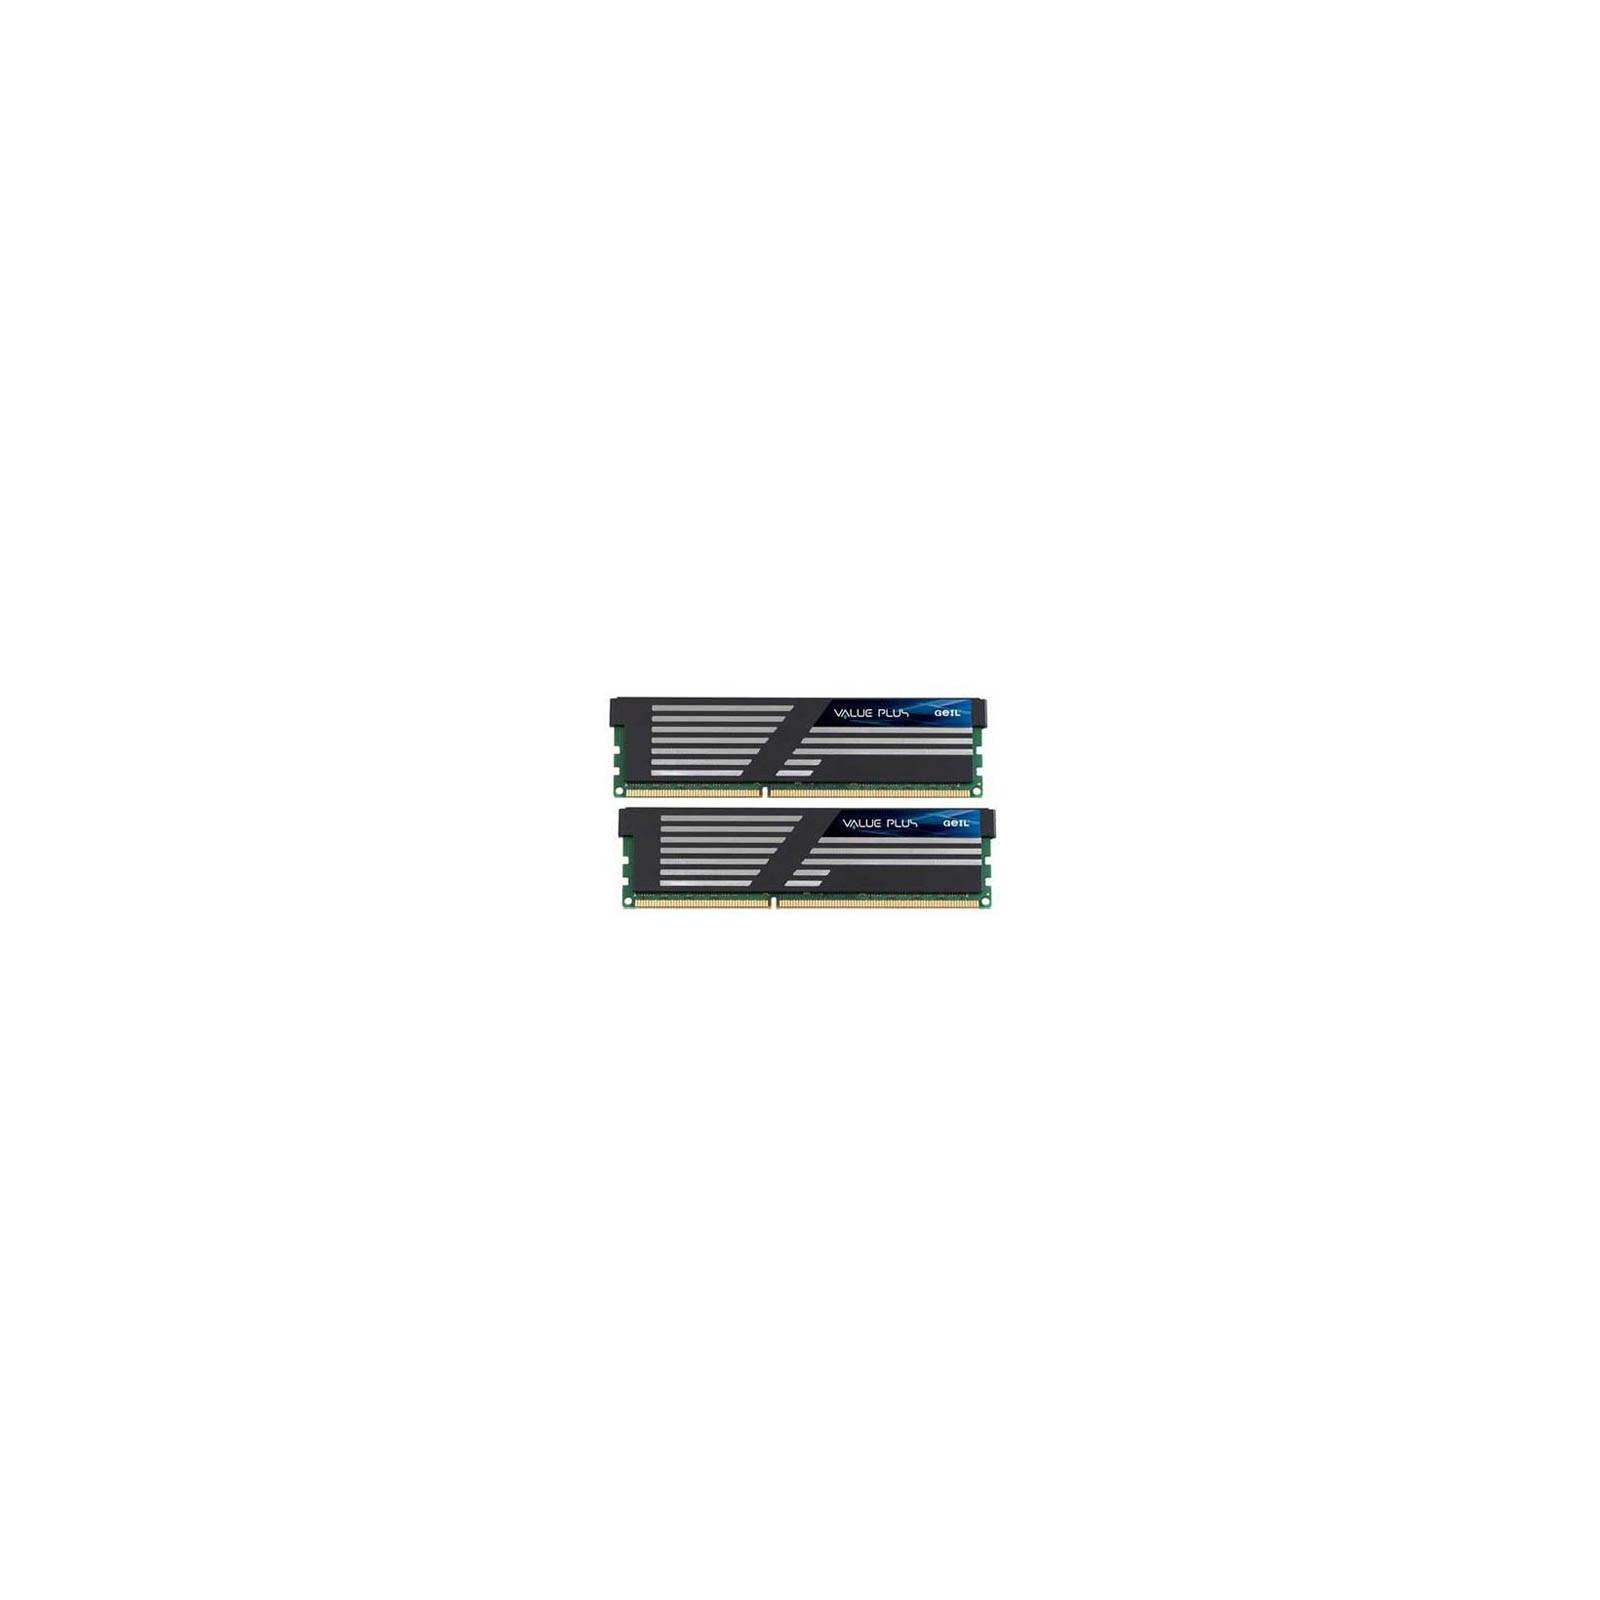 Модуль памяти для компьютера DDR3 4GB 1333 MHz GEIL (GVP34GB1333C7SC)